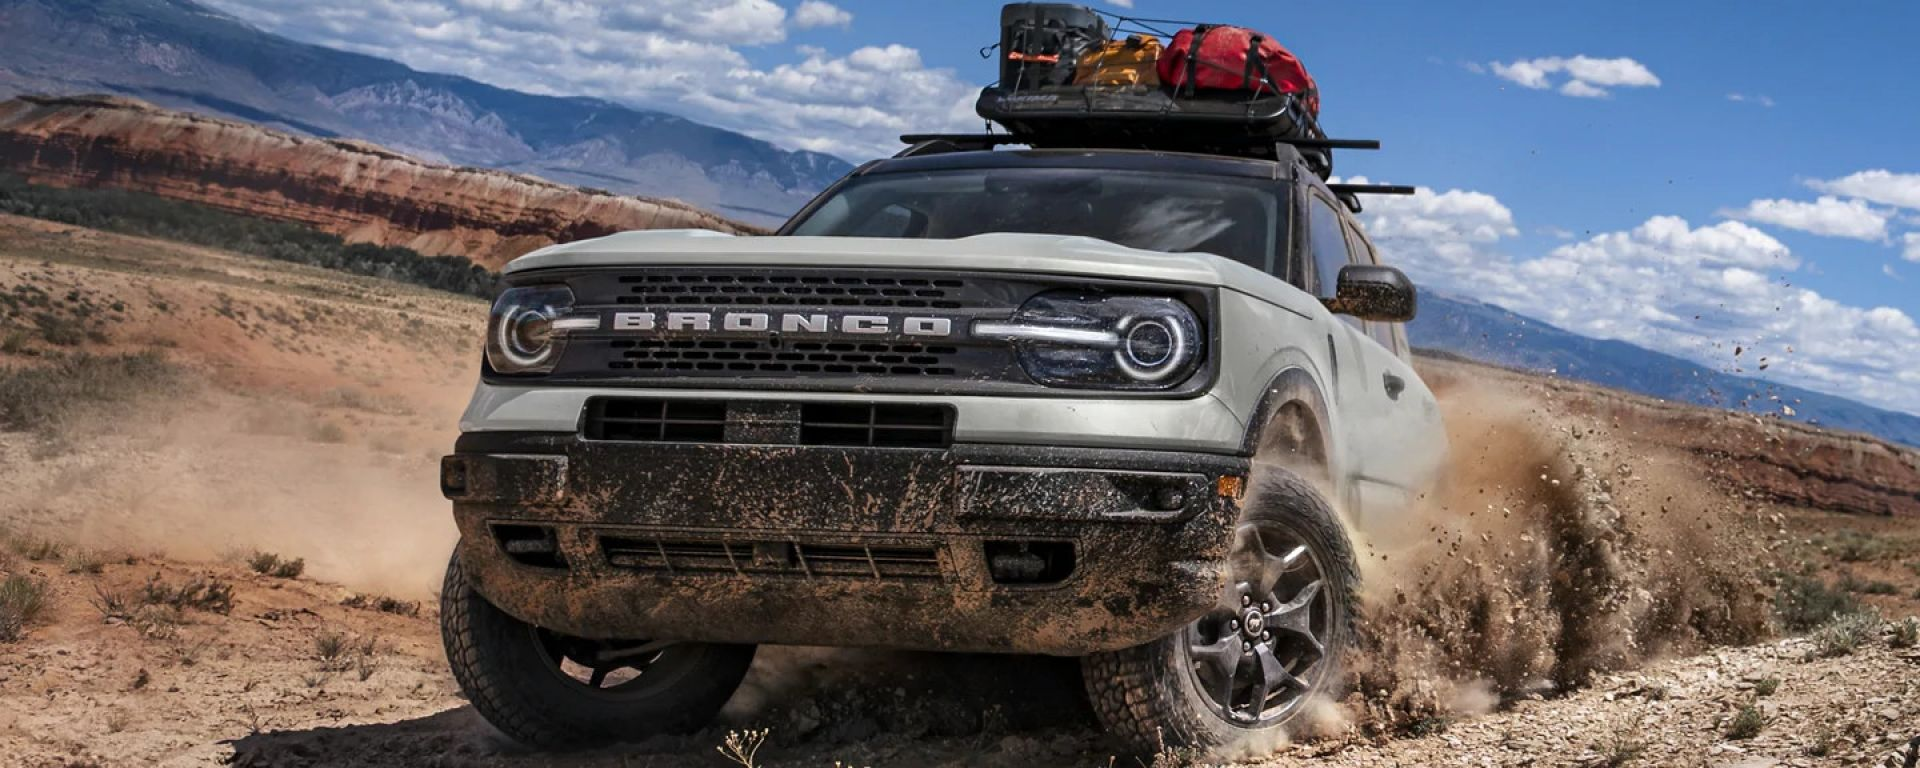 Ford Bronco Sport sfida l'Hell's Gate di Moab